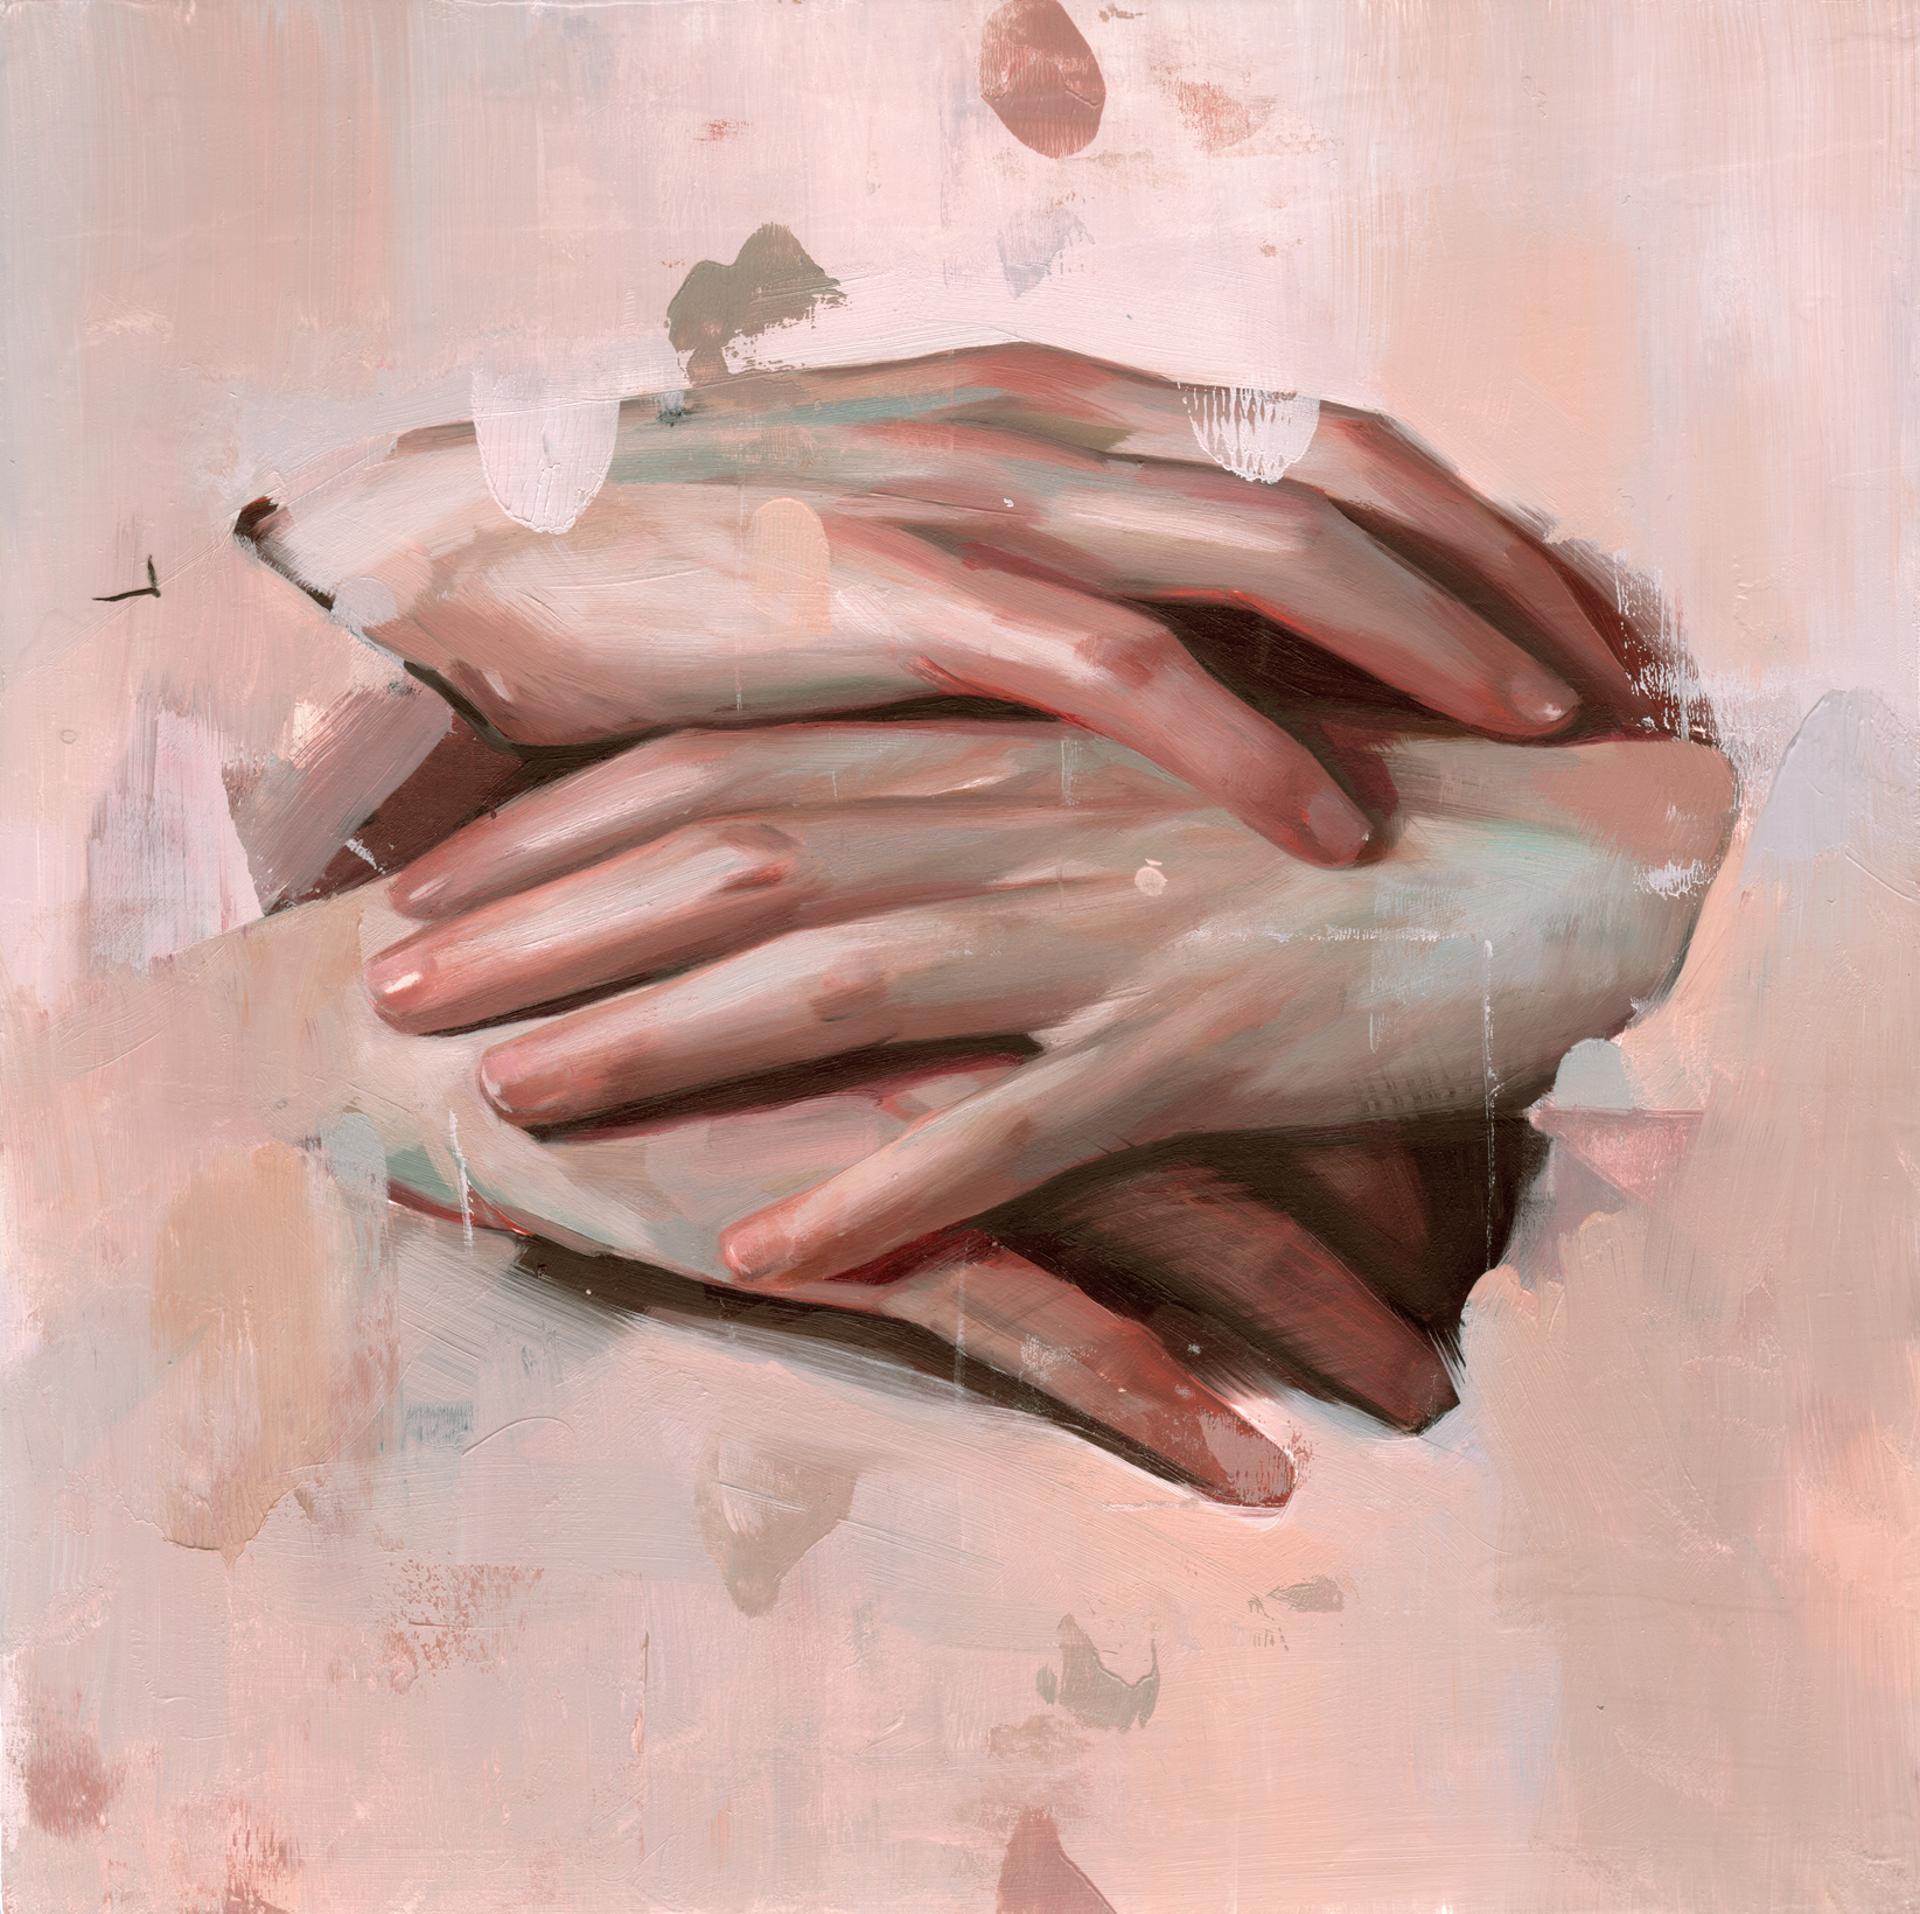 Vessel by Alpay Efe